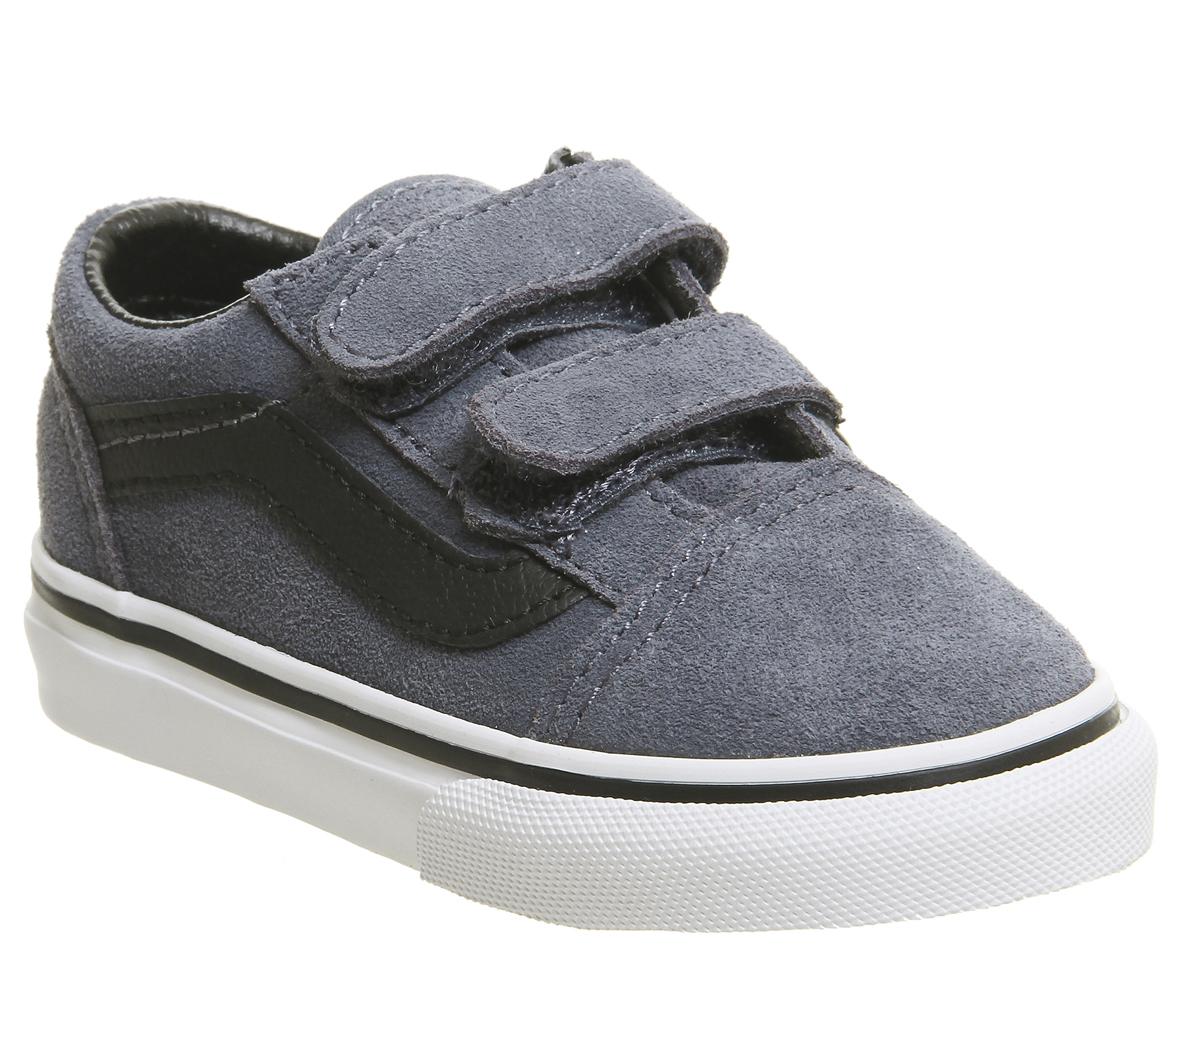 SENTINEL Bambini Vans Old Skool Toddler formatori grisaglia blu neri  bianchi bambini b6172b6e17e